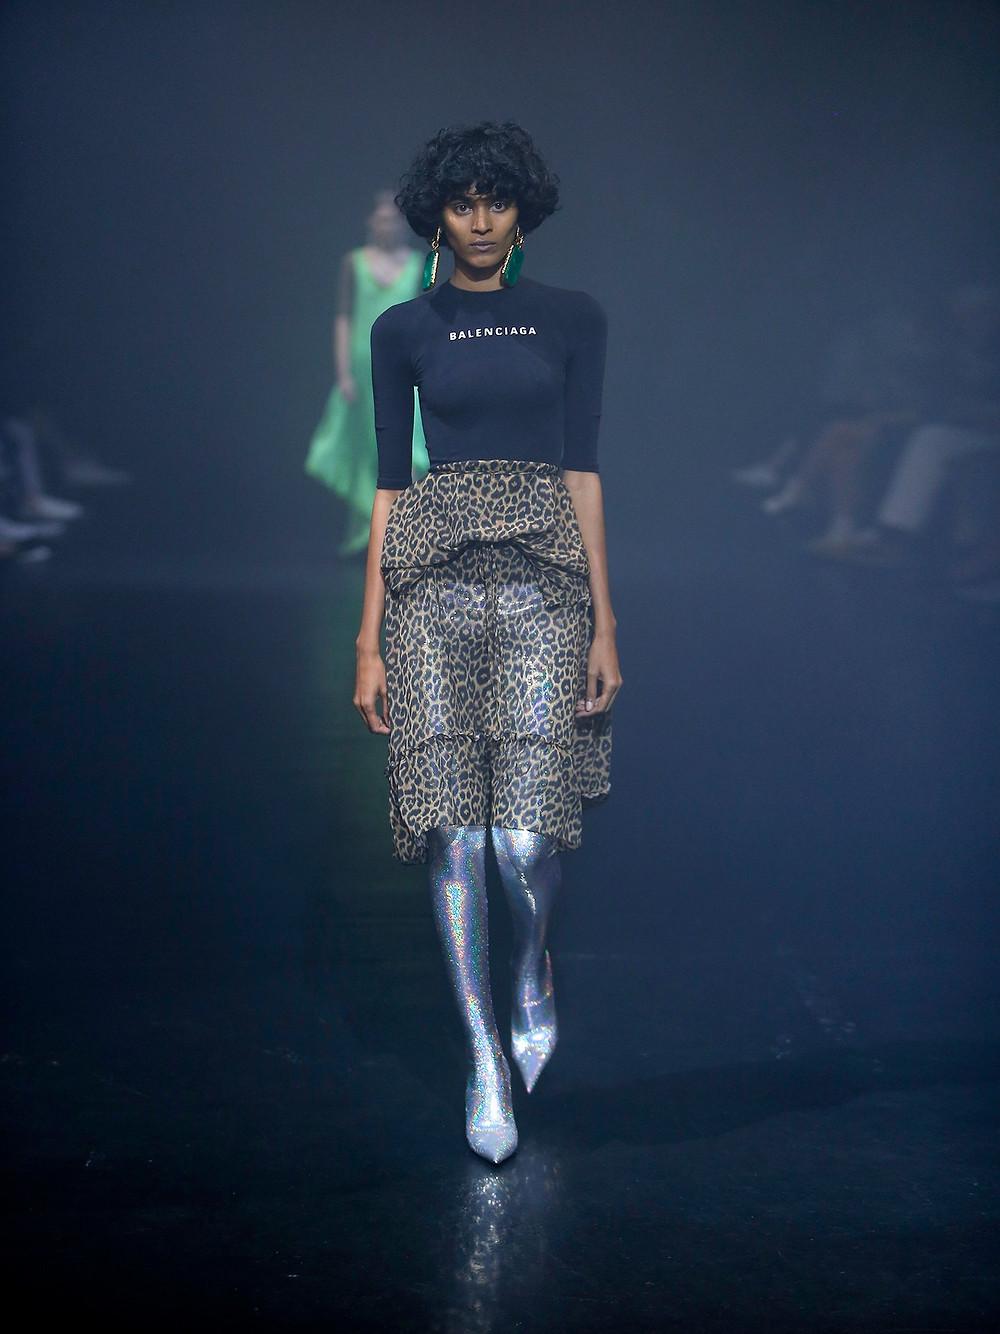 Balenciaga Stretch-jersey and leopard-print crepe dress $1,950